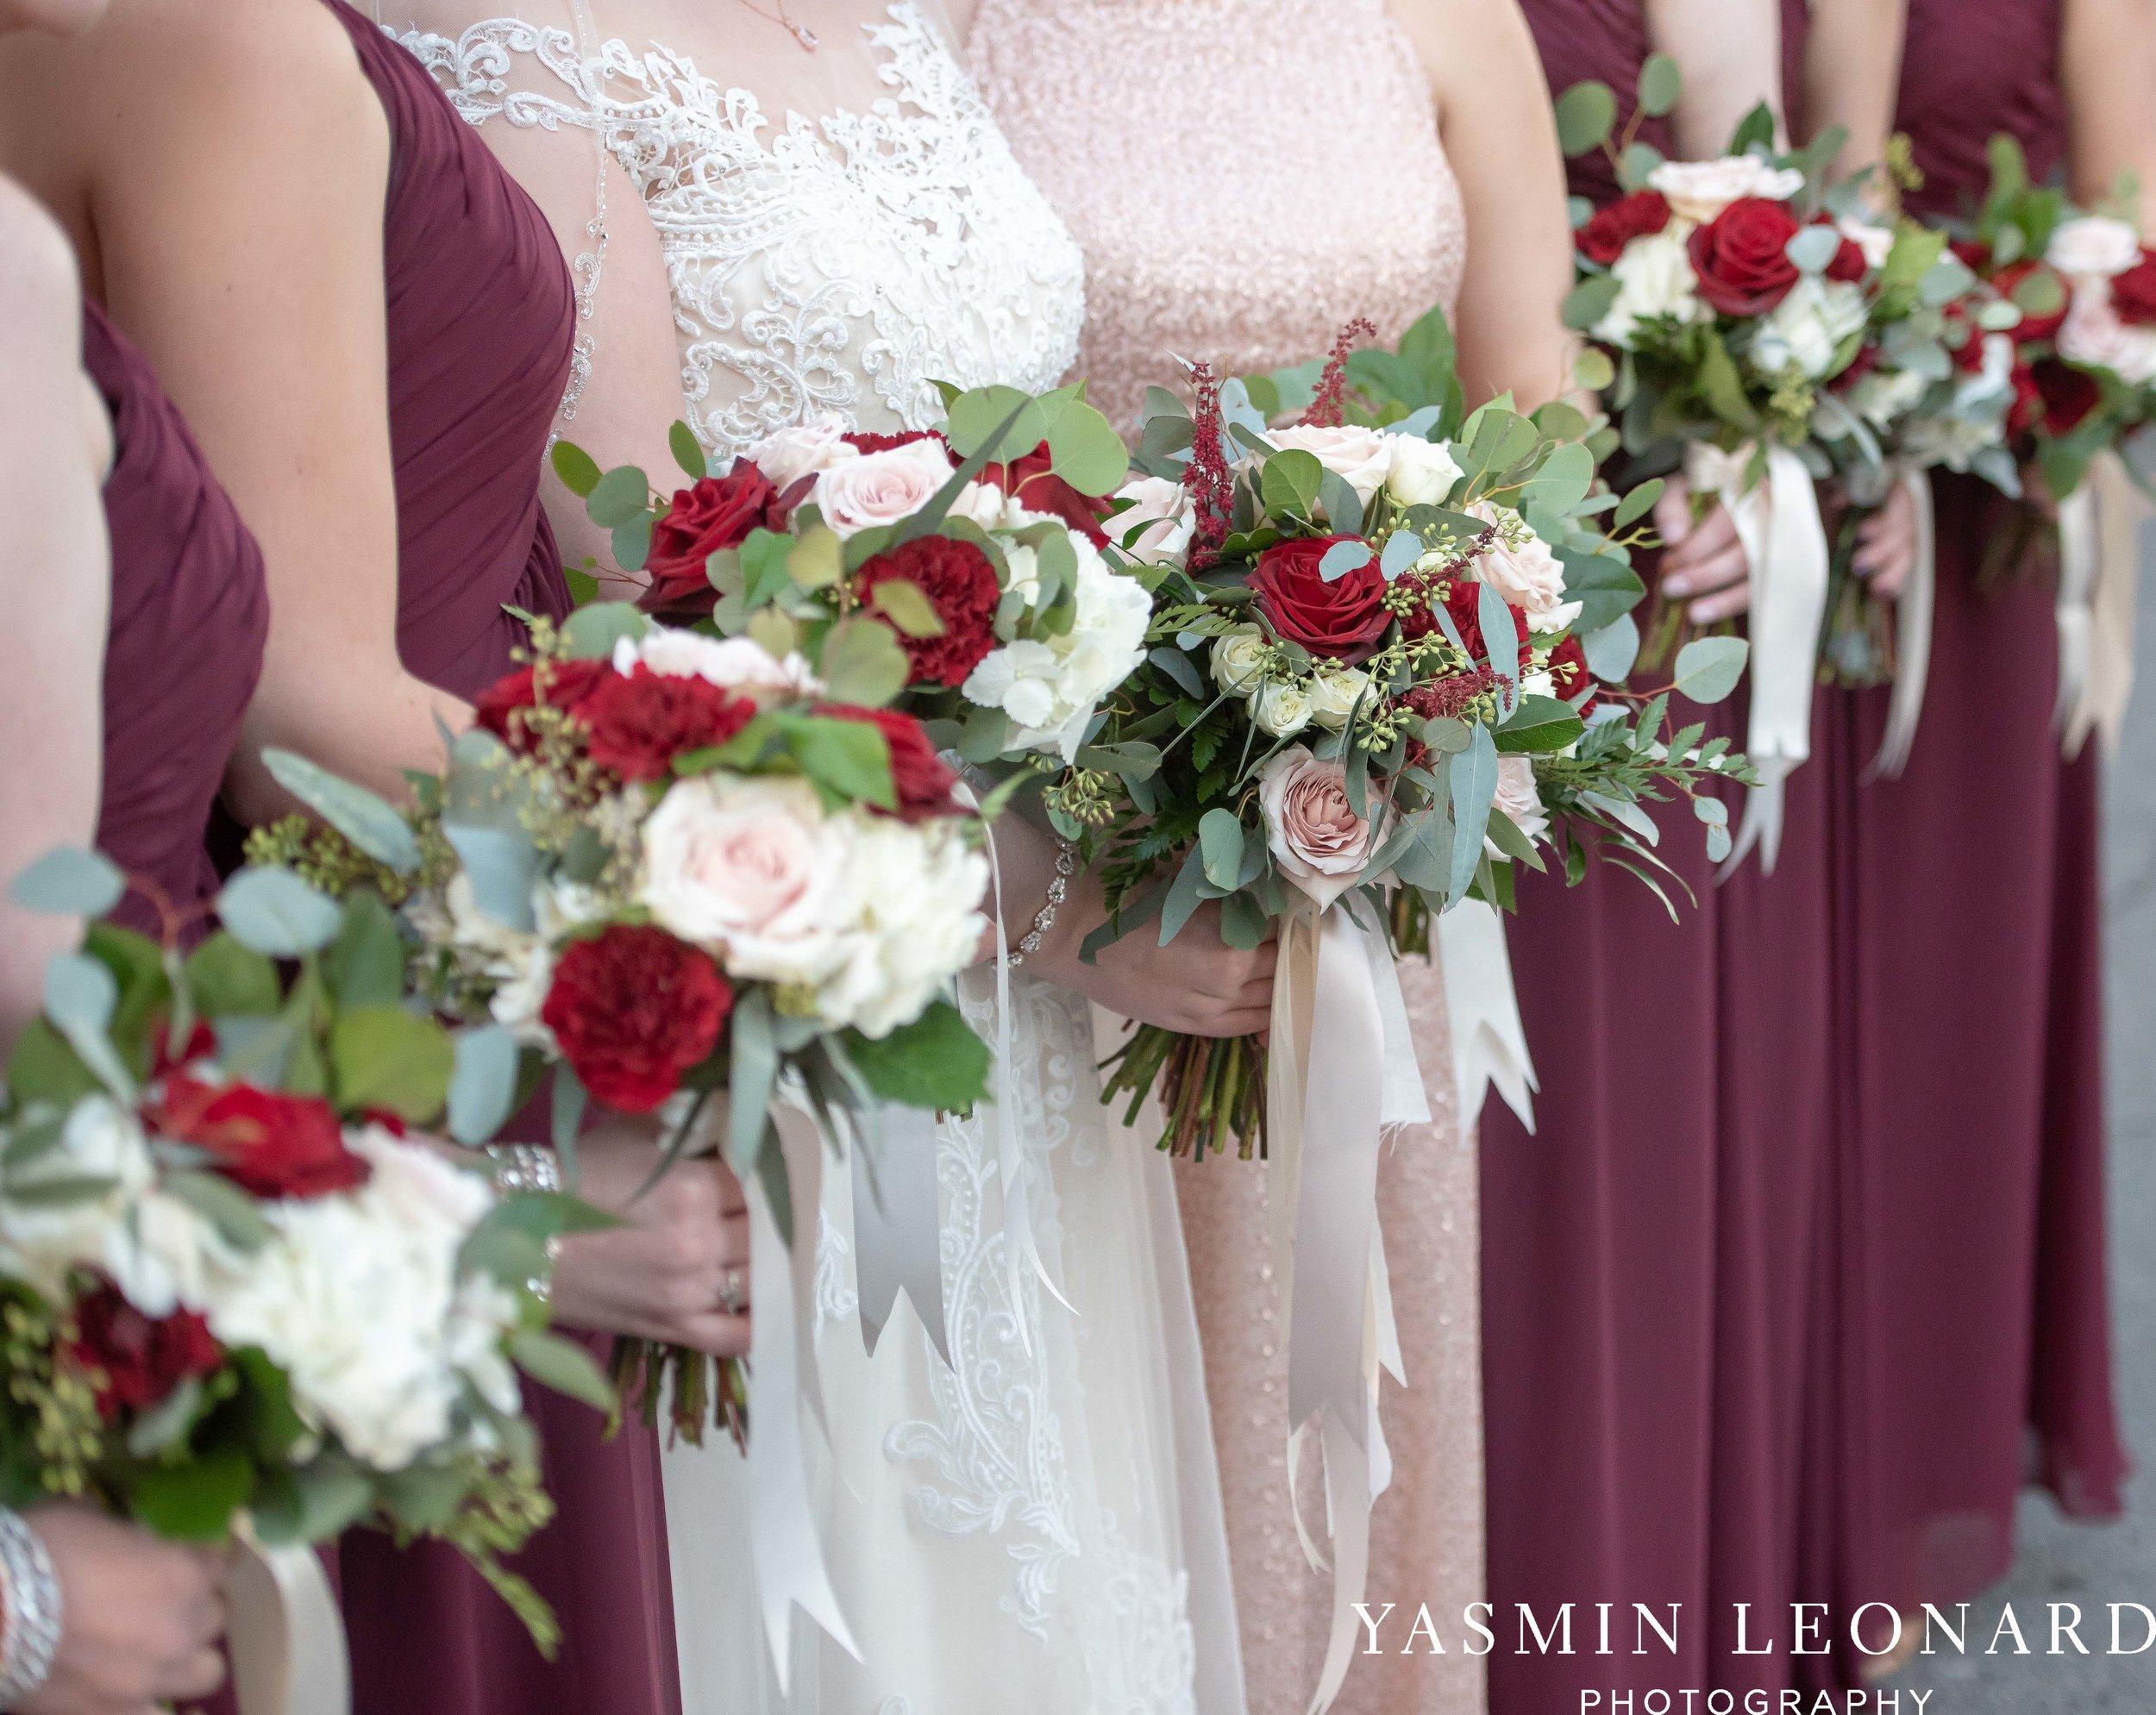 Rebekah and Matt - 105 Worth Event Centre - Yasmin Leonard Photography - Asheboro Wedding - NC Wedding - High Point Weddings - Triad Weddings - Winter Wedding-16.jpg